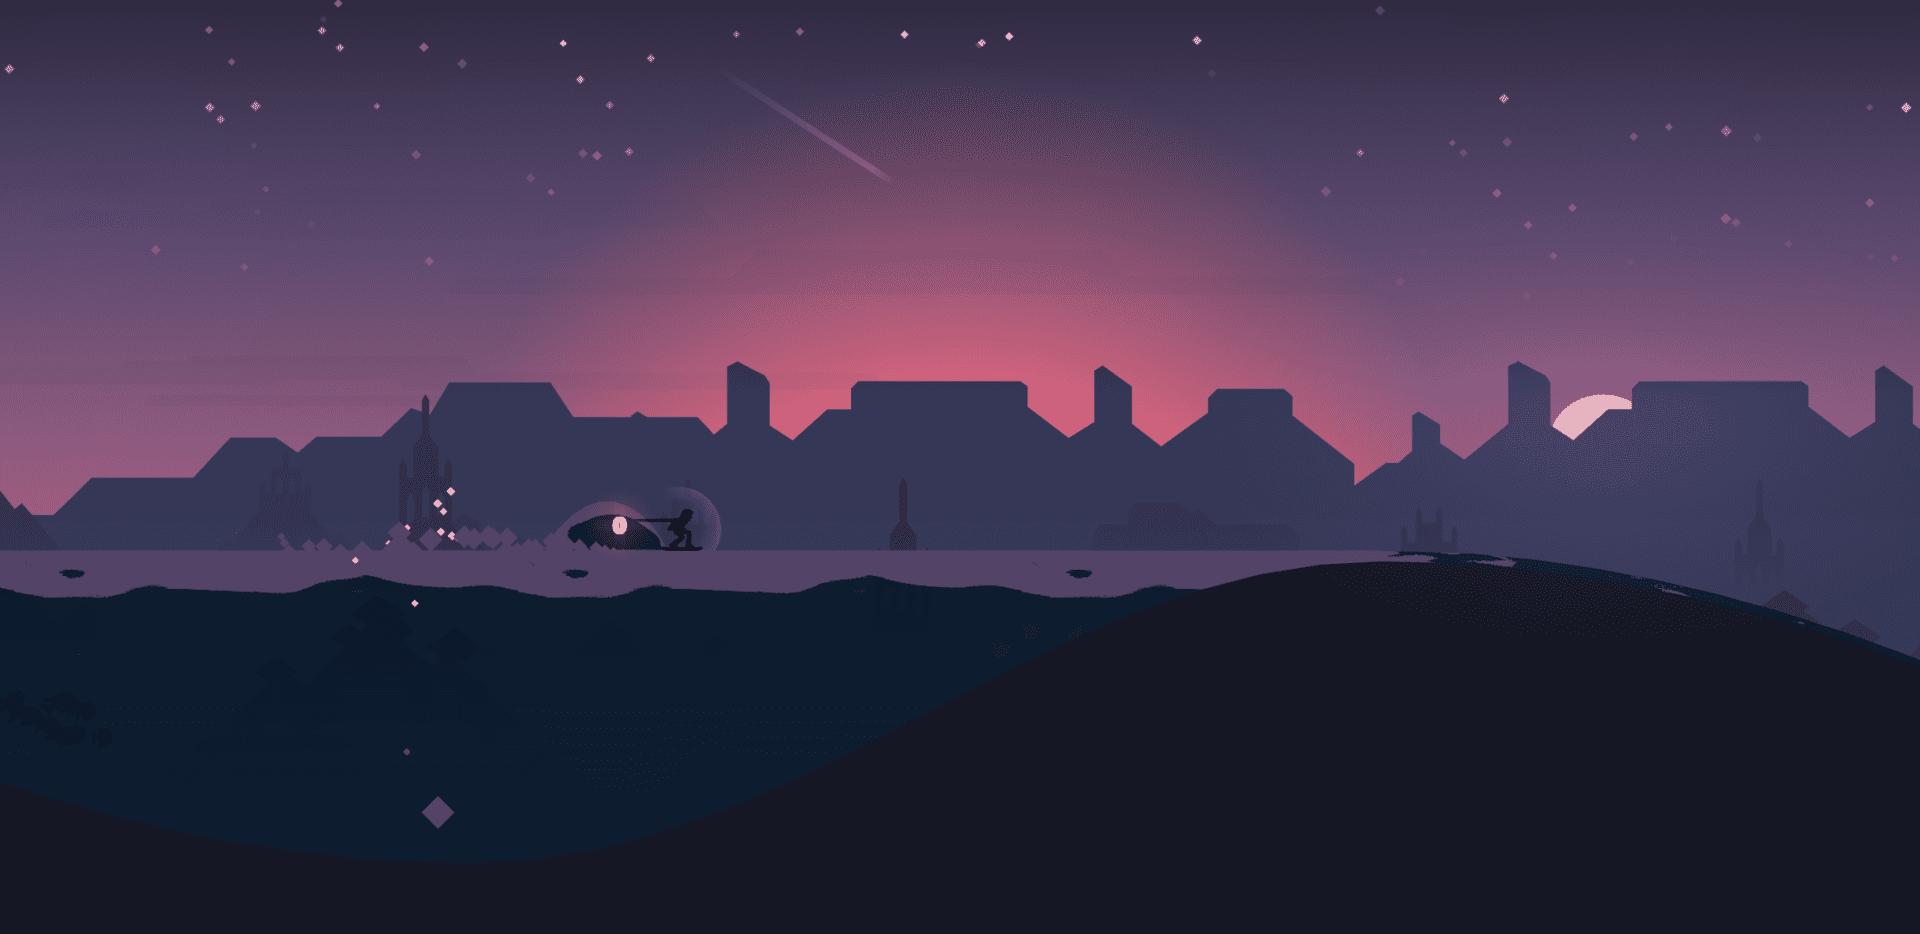 Alto's Odyssey Nighttime